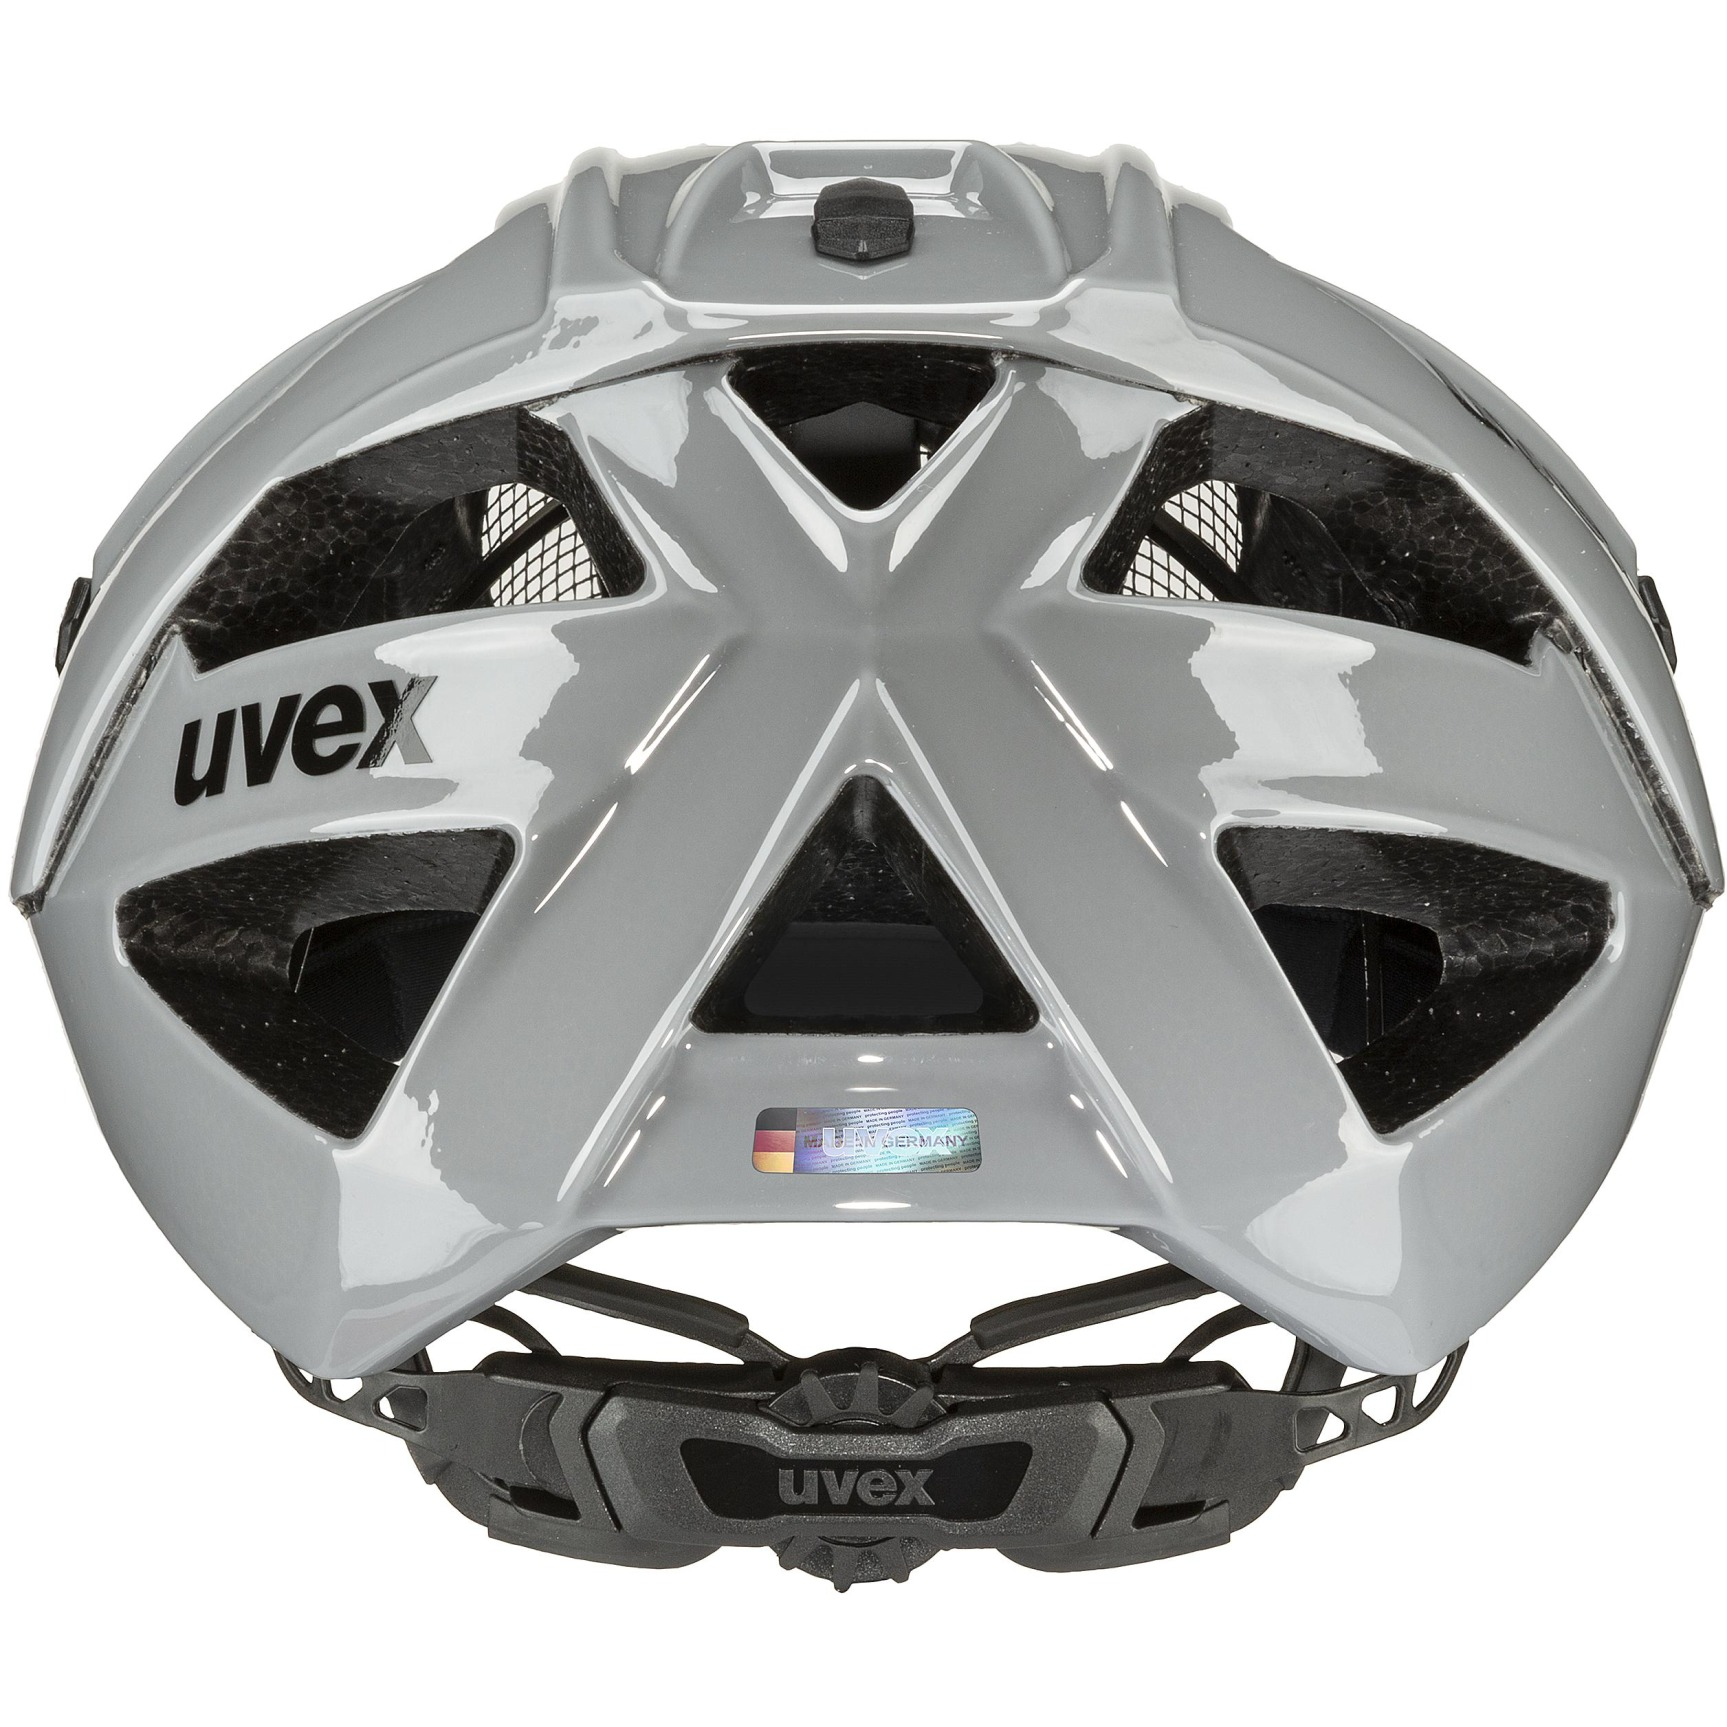 Bild von Uvex quatro Helm - rhino black